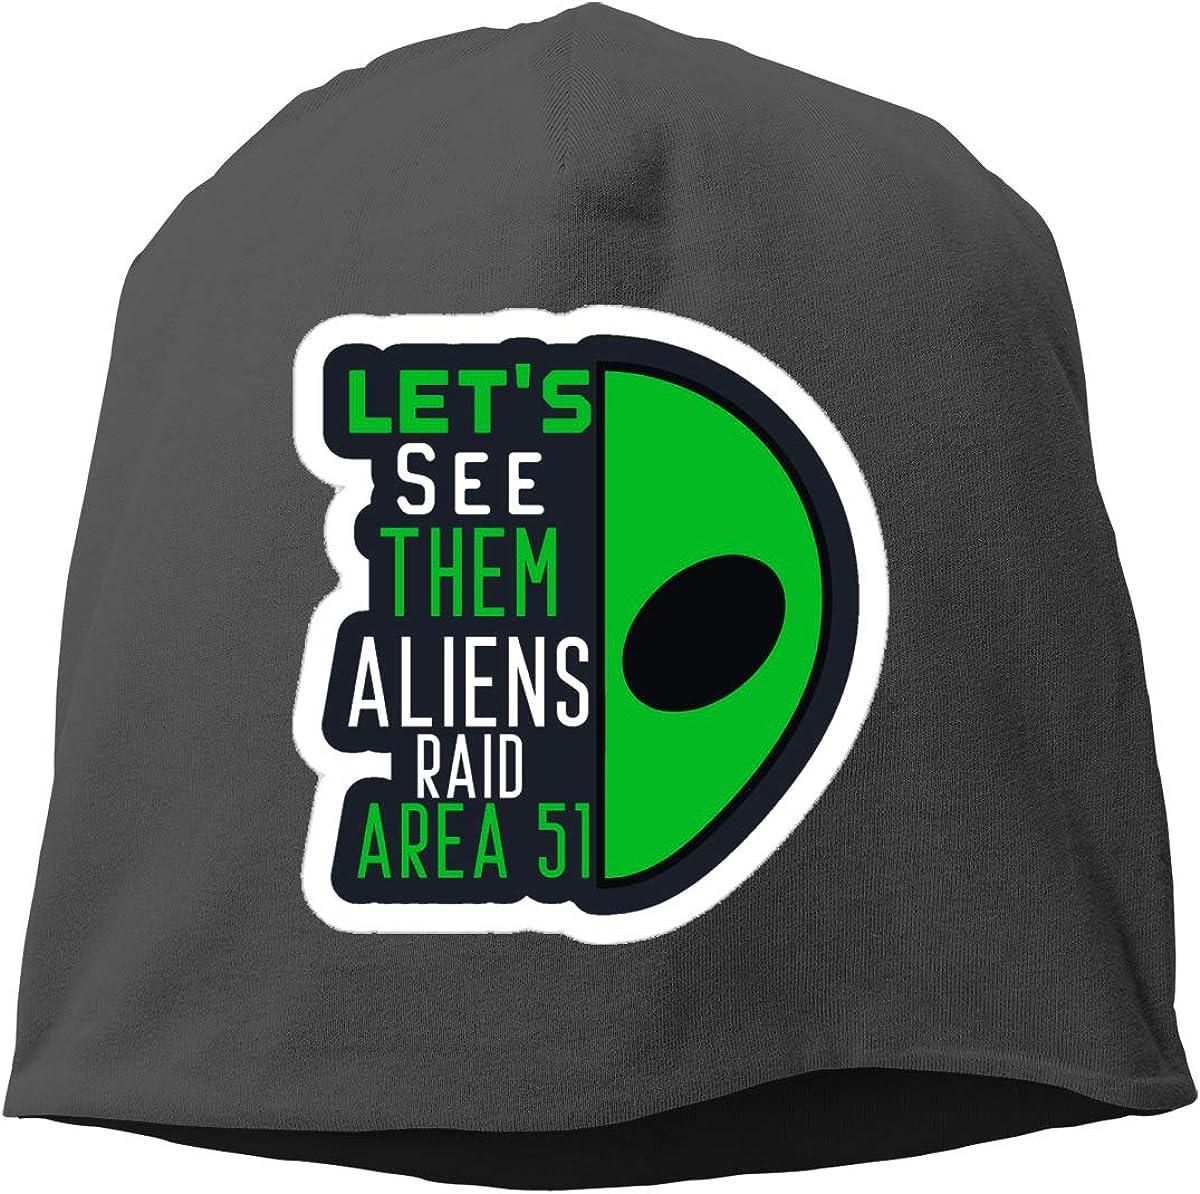 Lets See Them Aliens Raid Area 51 Skull Cap Helmet Liner Beanie Cap for Men Hip Hop Hedging Head Hat